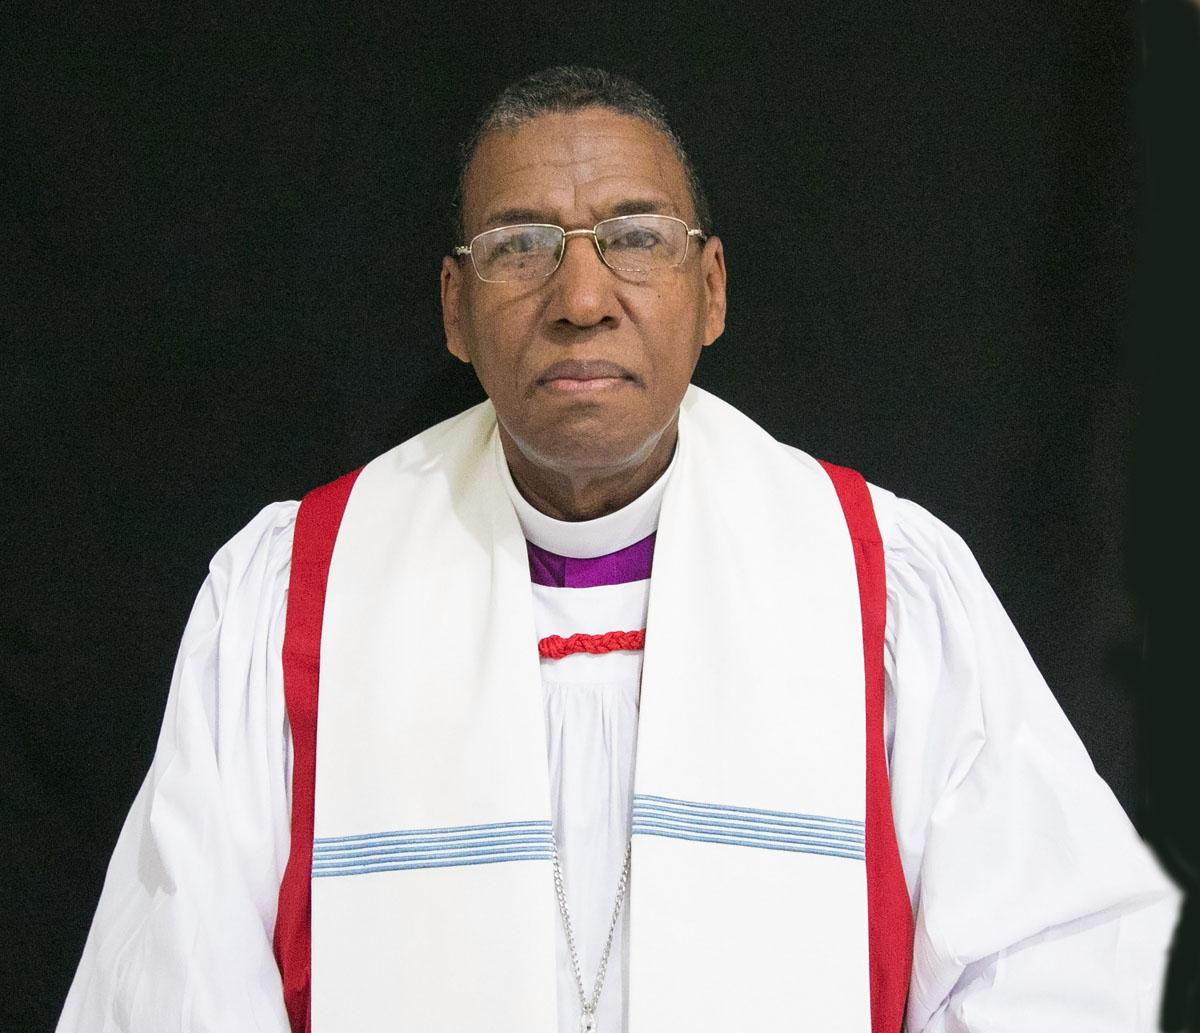 Bishop Holguín